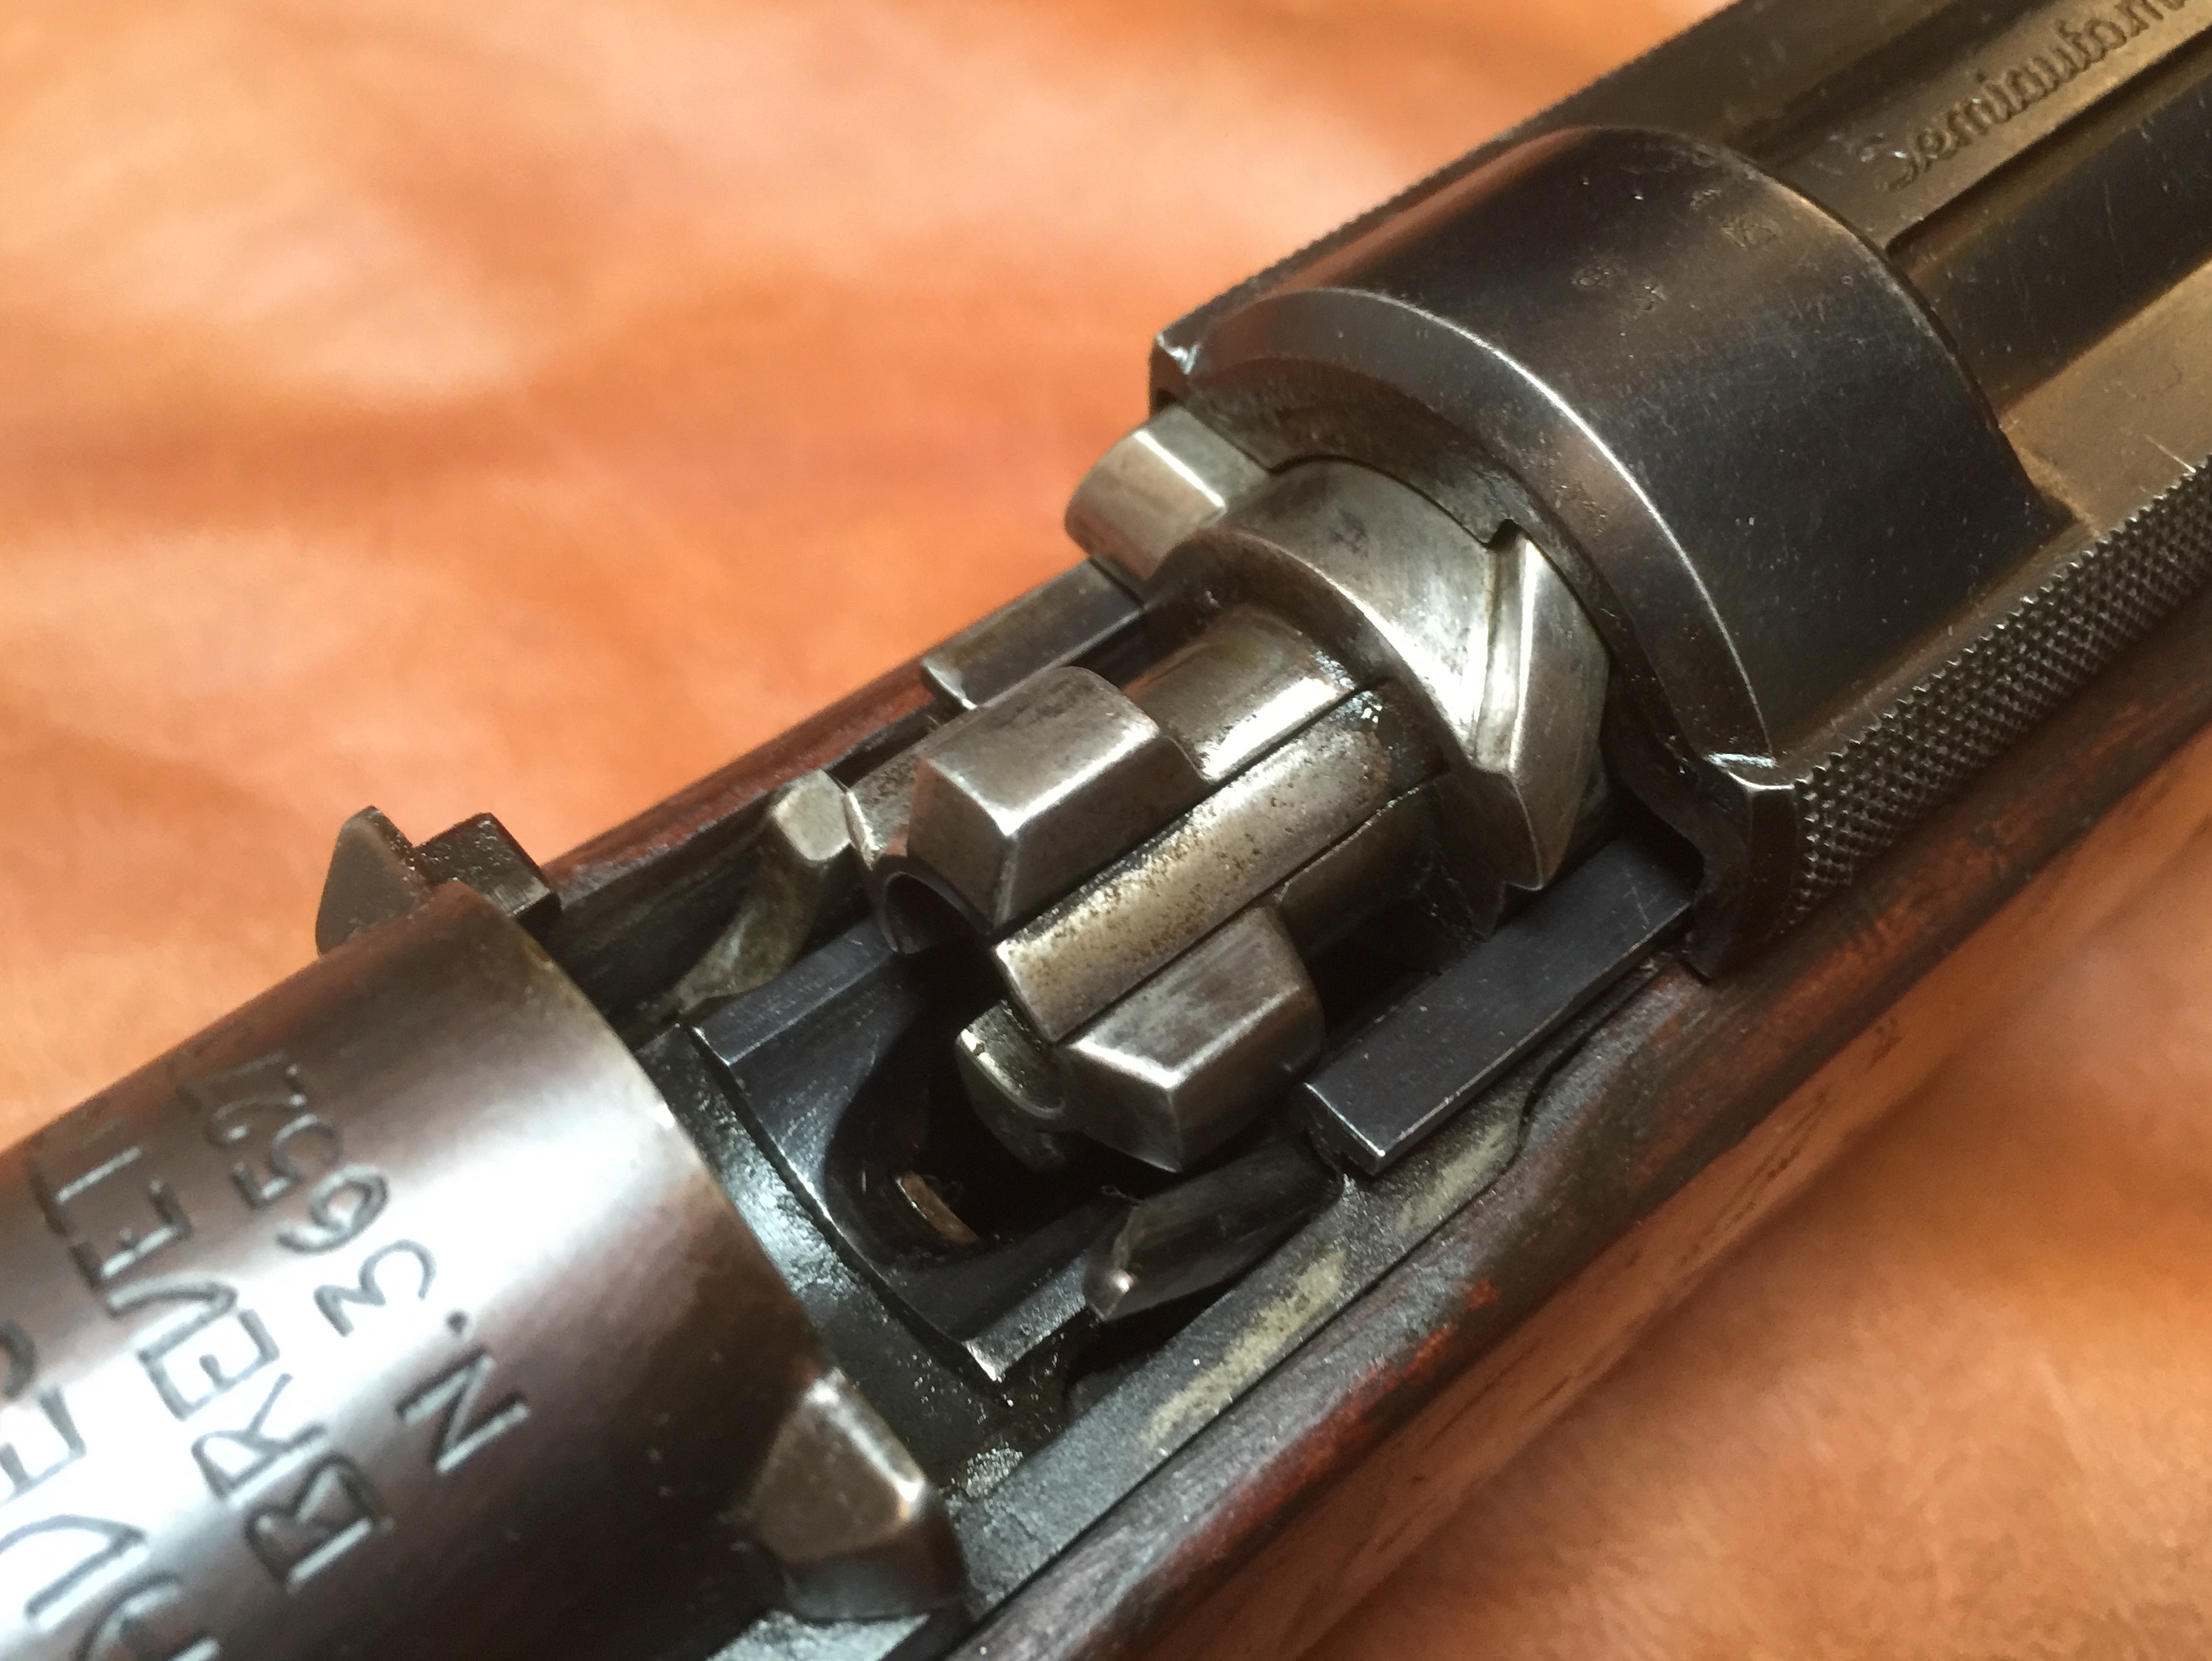 lercker machine pistol